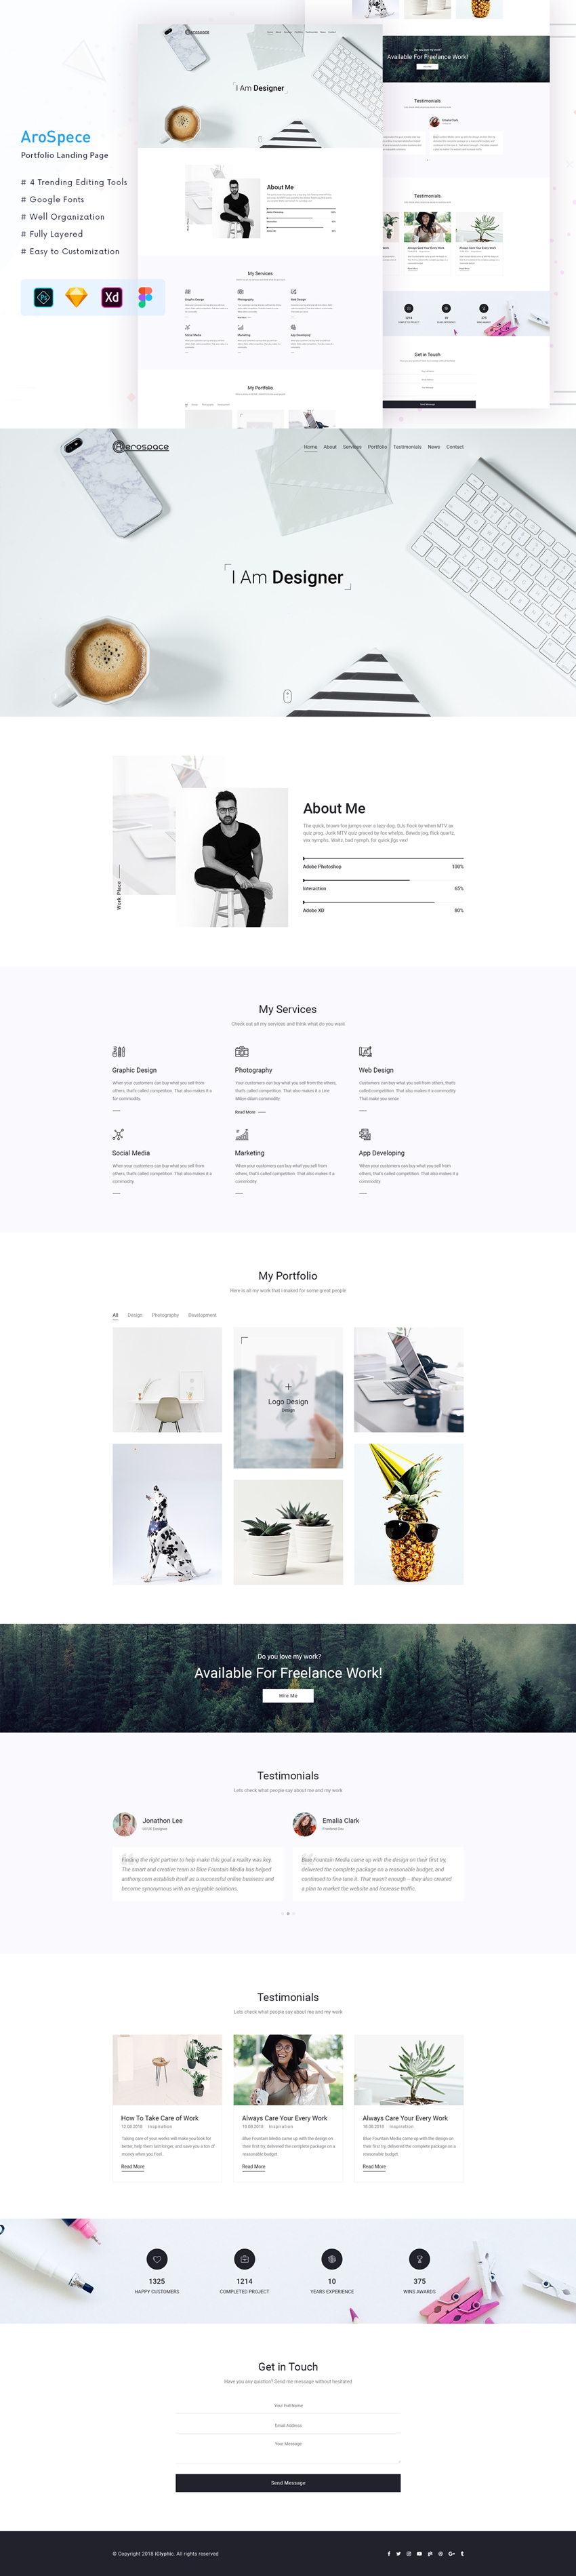 Portfolio Landing Page for PSD